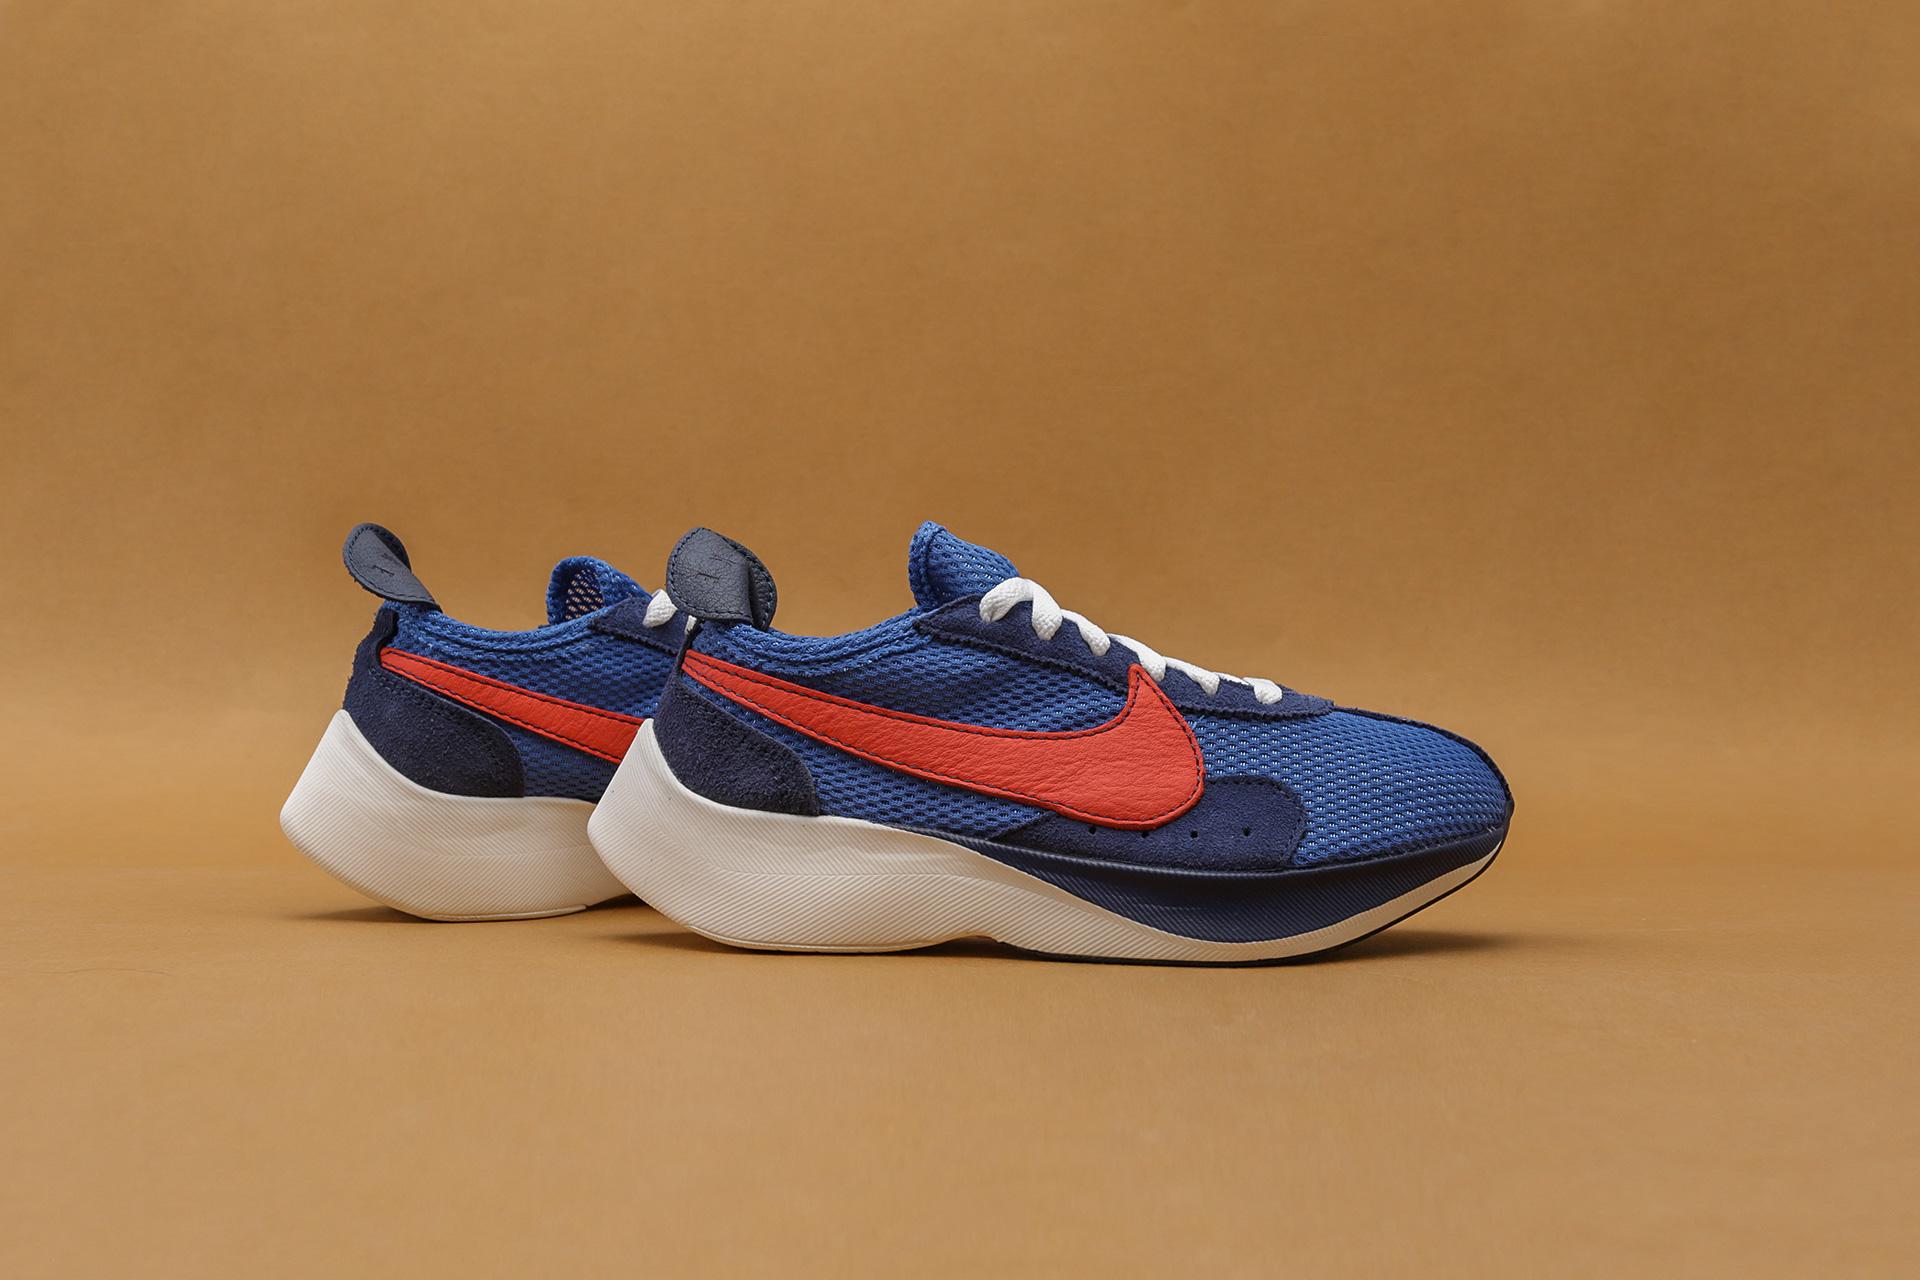 67edd532 Купить синие мужские кроссовки Moon Racer QS от Nike (BV7779-400) по ...